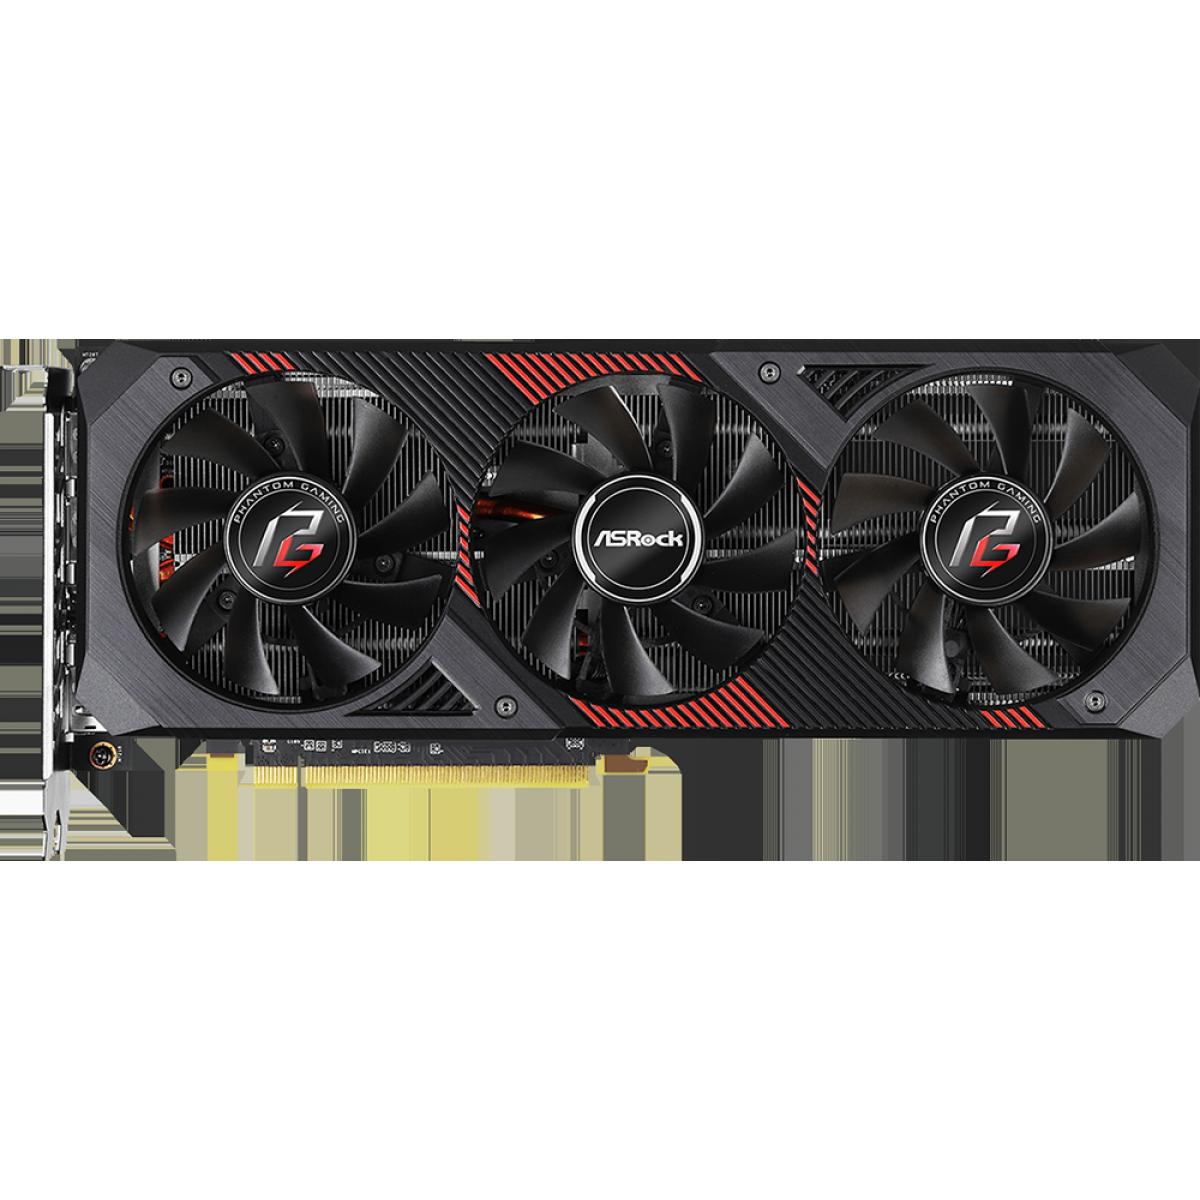 Placa de Vídeo ASRock AMD Radeon RX 5600 XT Phantom Gaming D3 OC, 6GB, GDDR6, 192Bit, 90-GA1VZZ-00UANF